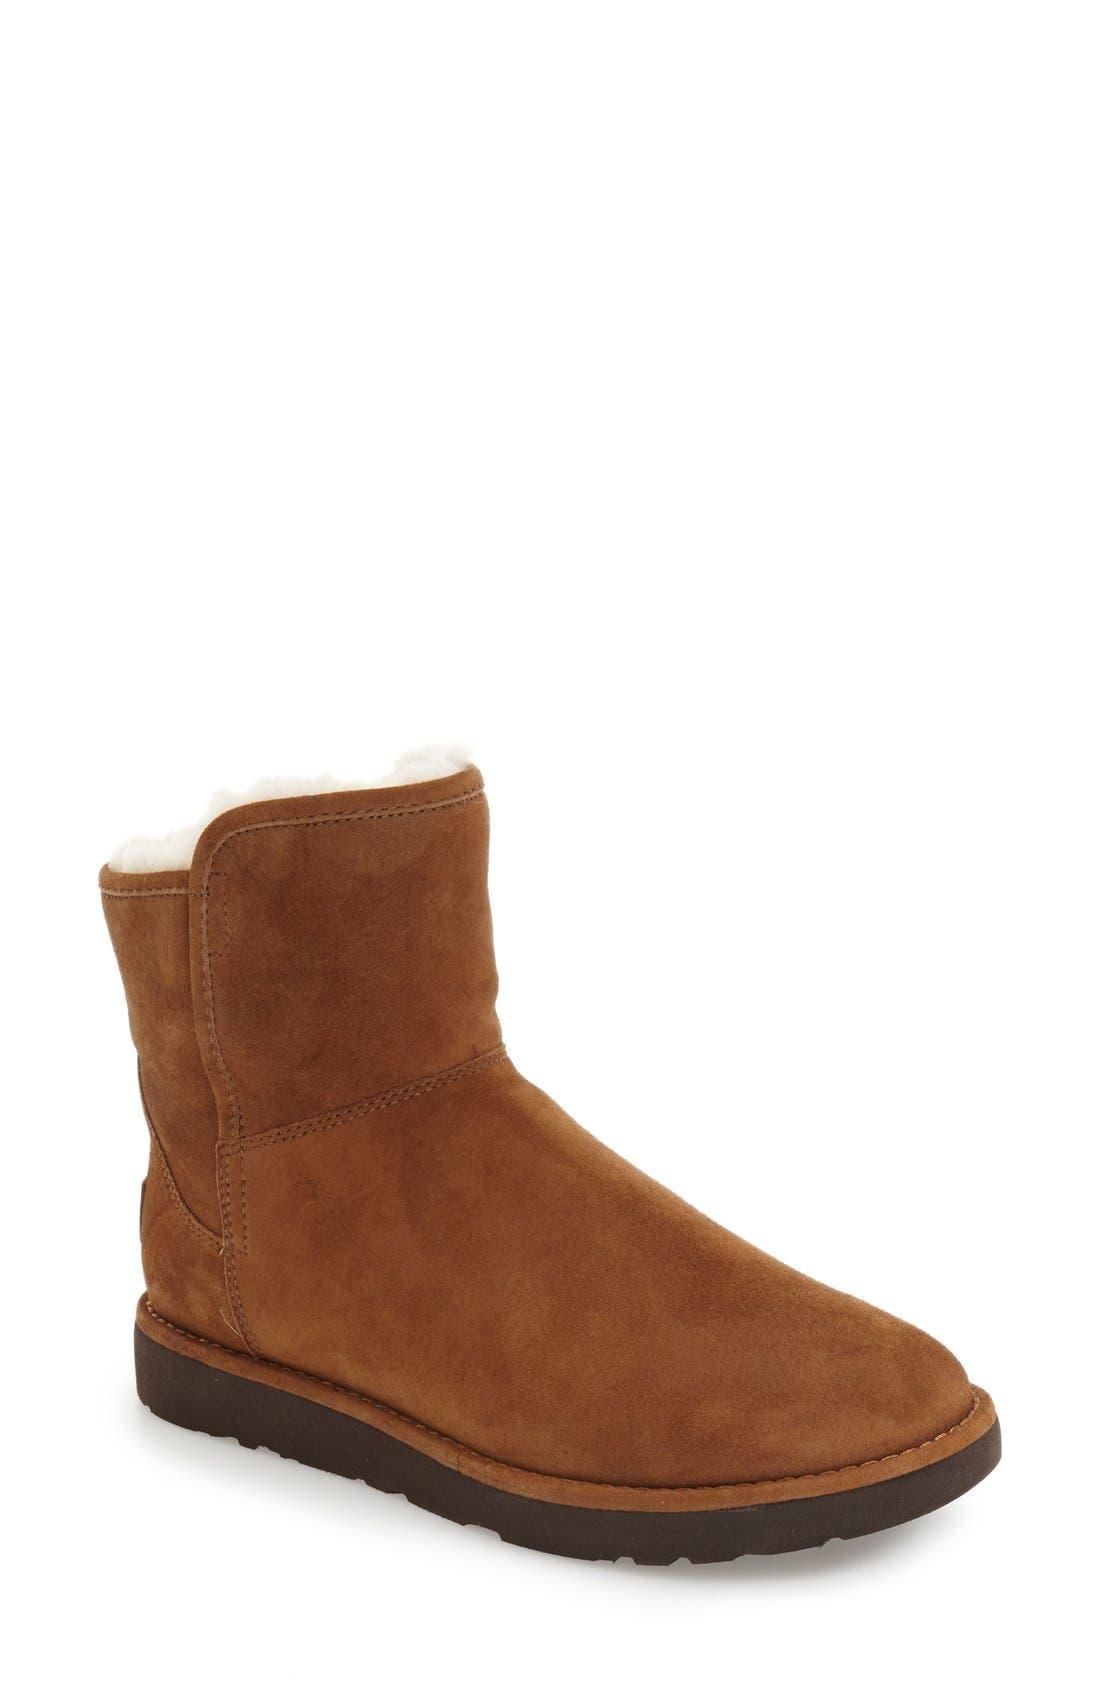 Alternate Image 1 Selected - UGG® Abree II Mini Boot (Women)